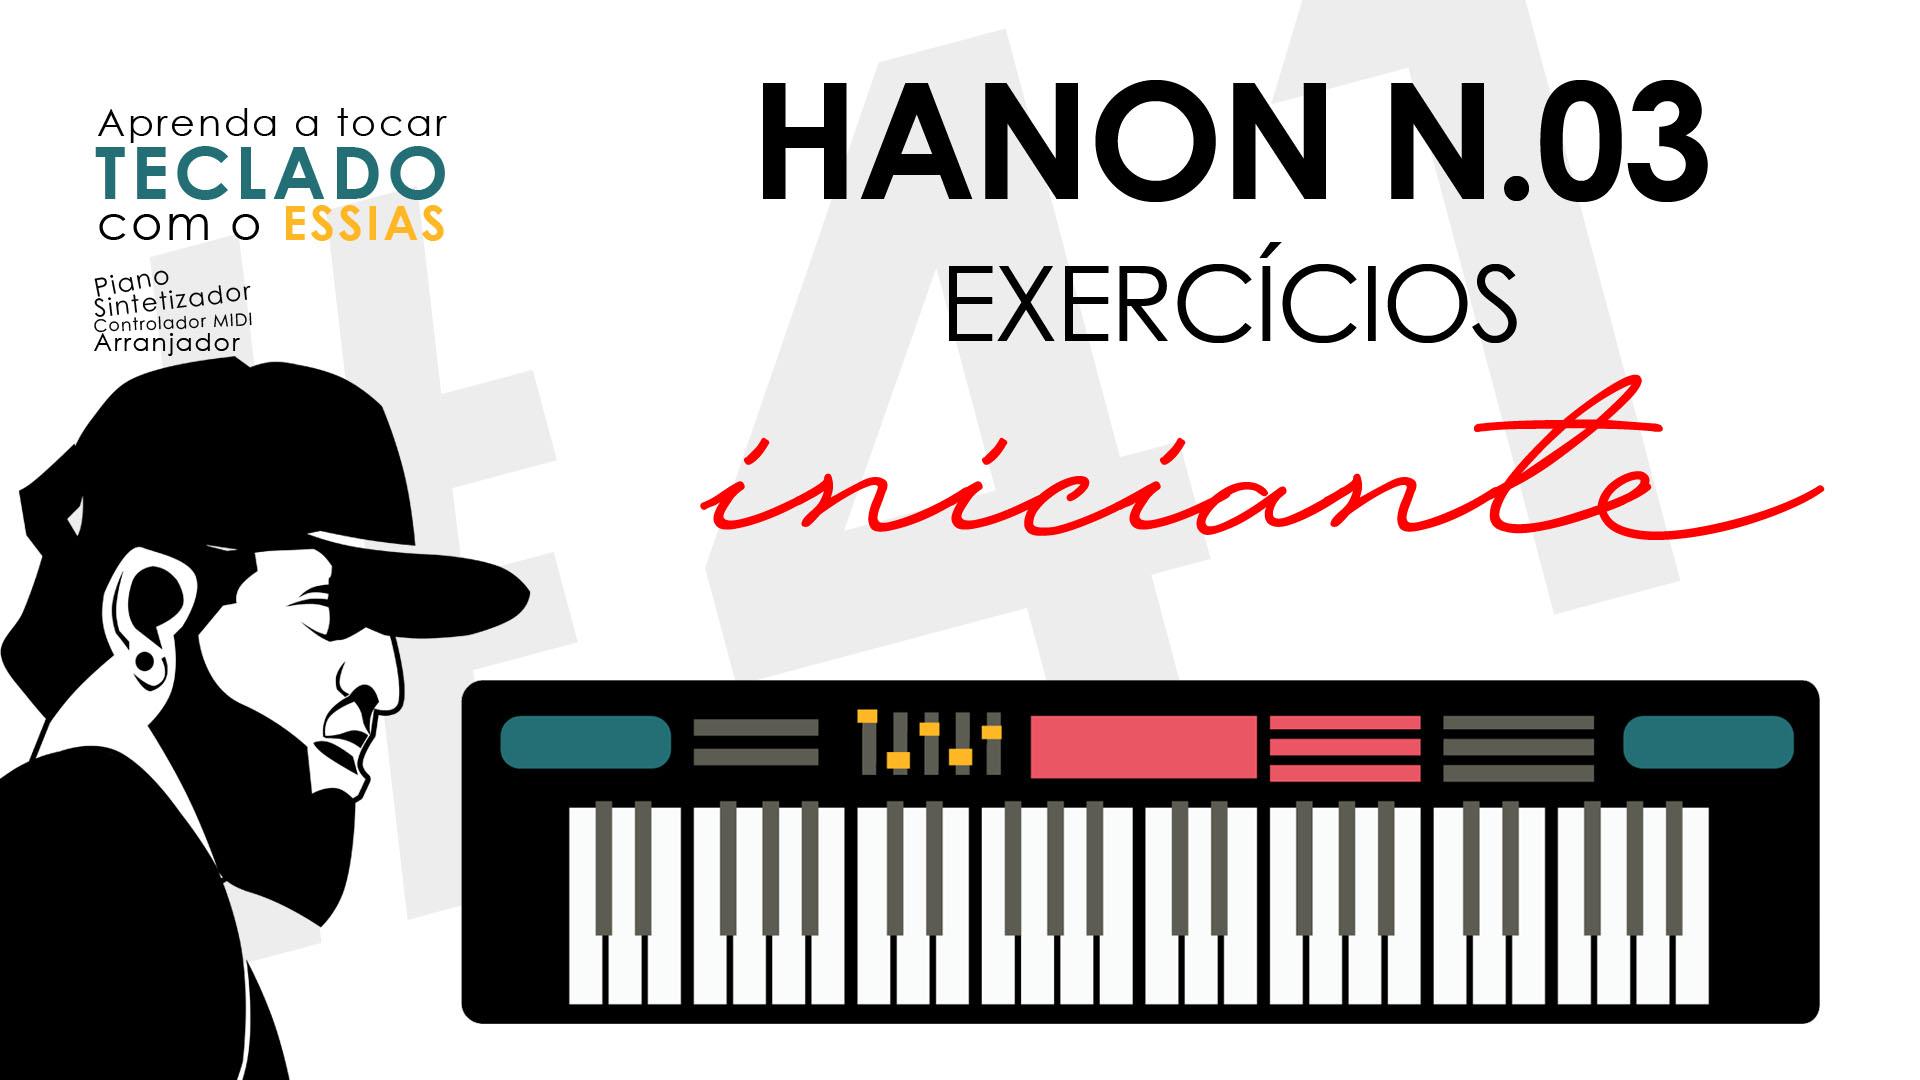 Exercícios Para Teclado – Hanon N.03 (Como Aumentar Agilidade no Teclado)